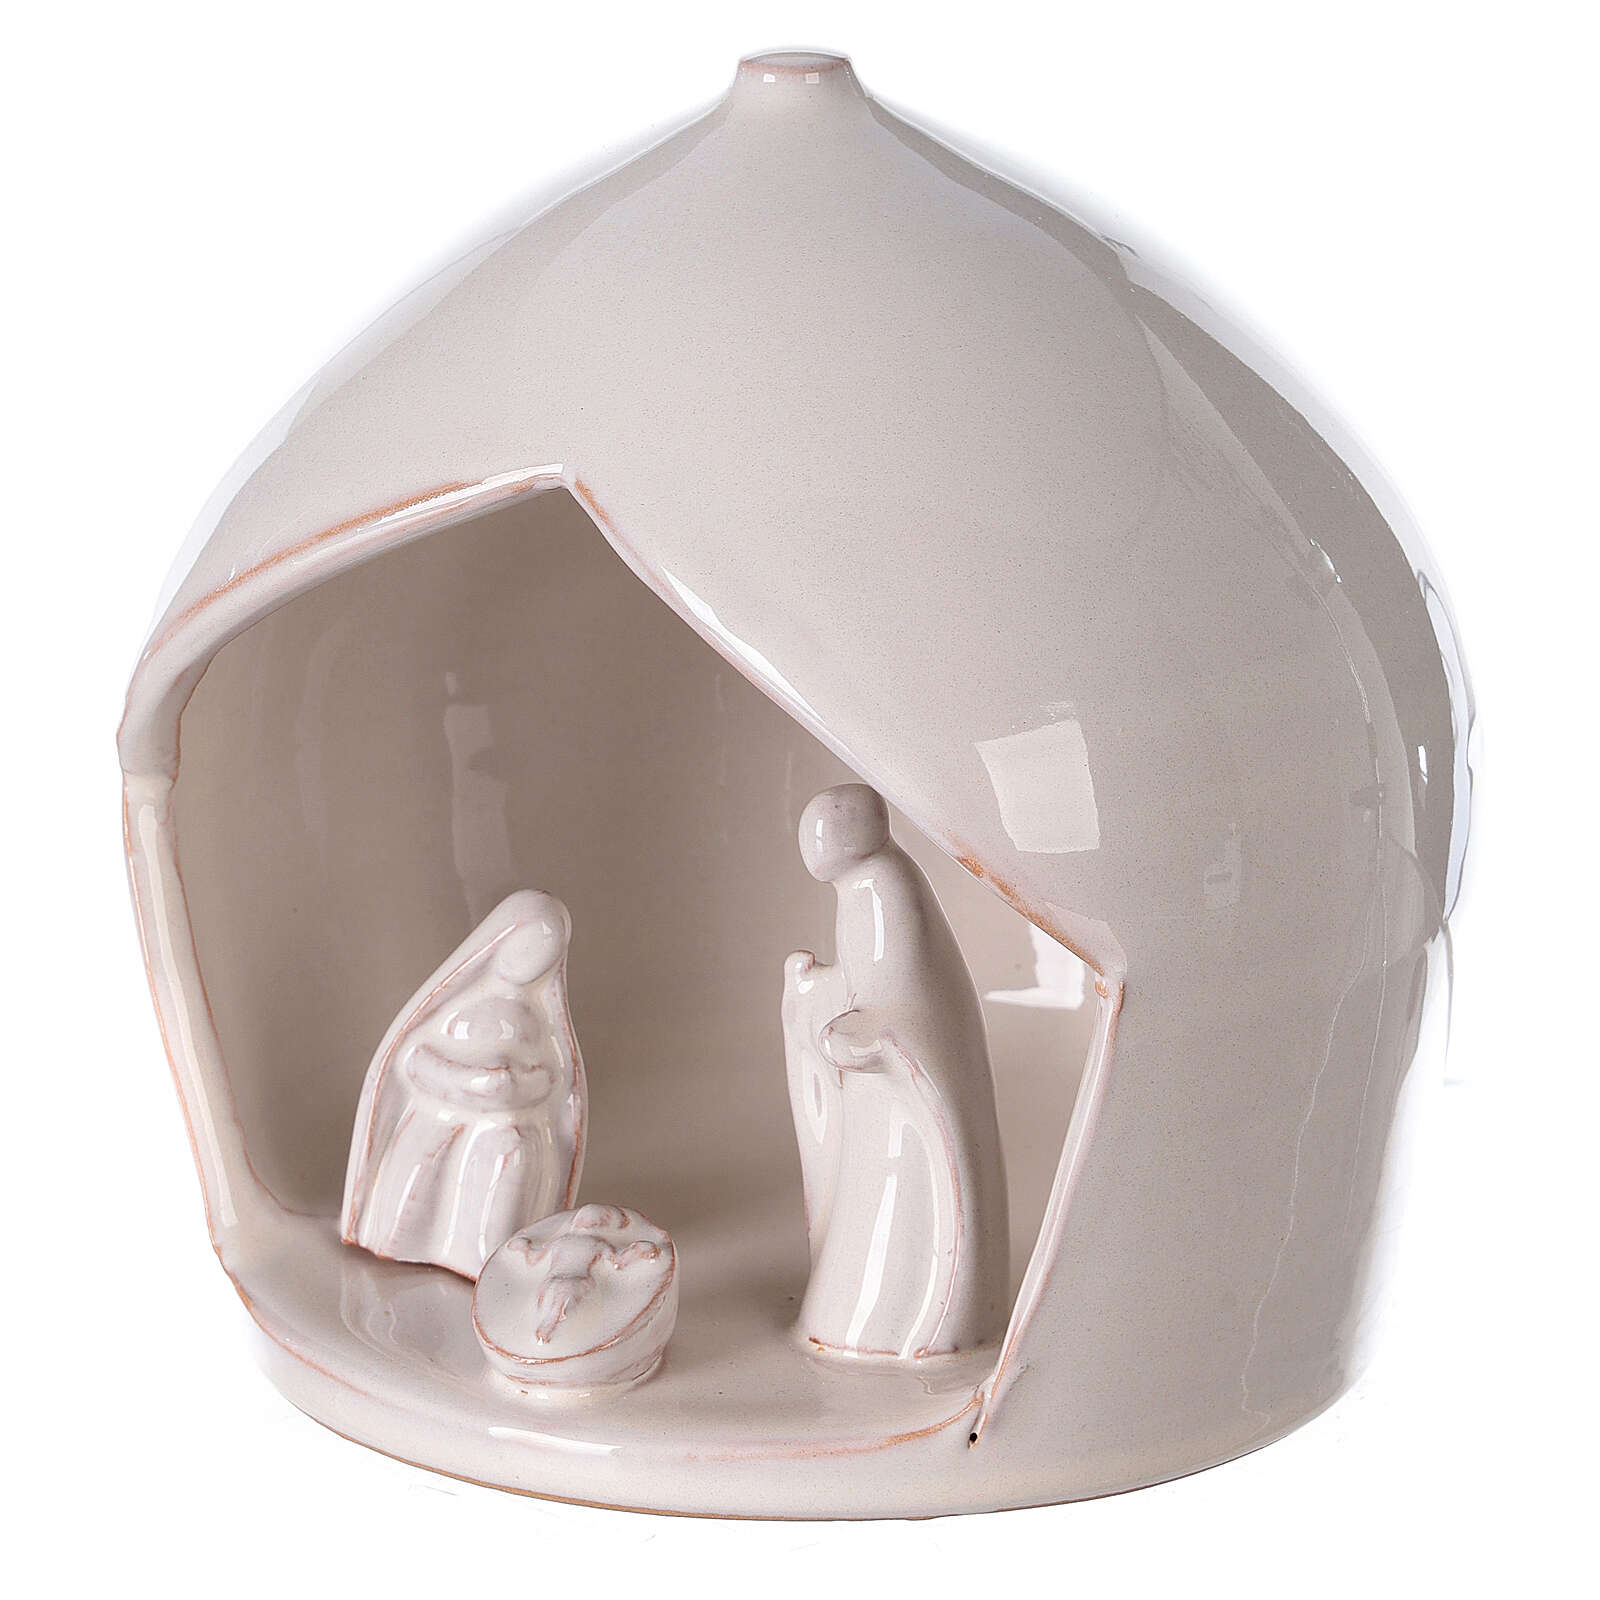 White Holy Family set in Deruta terracotta 16x15 cm 4